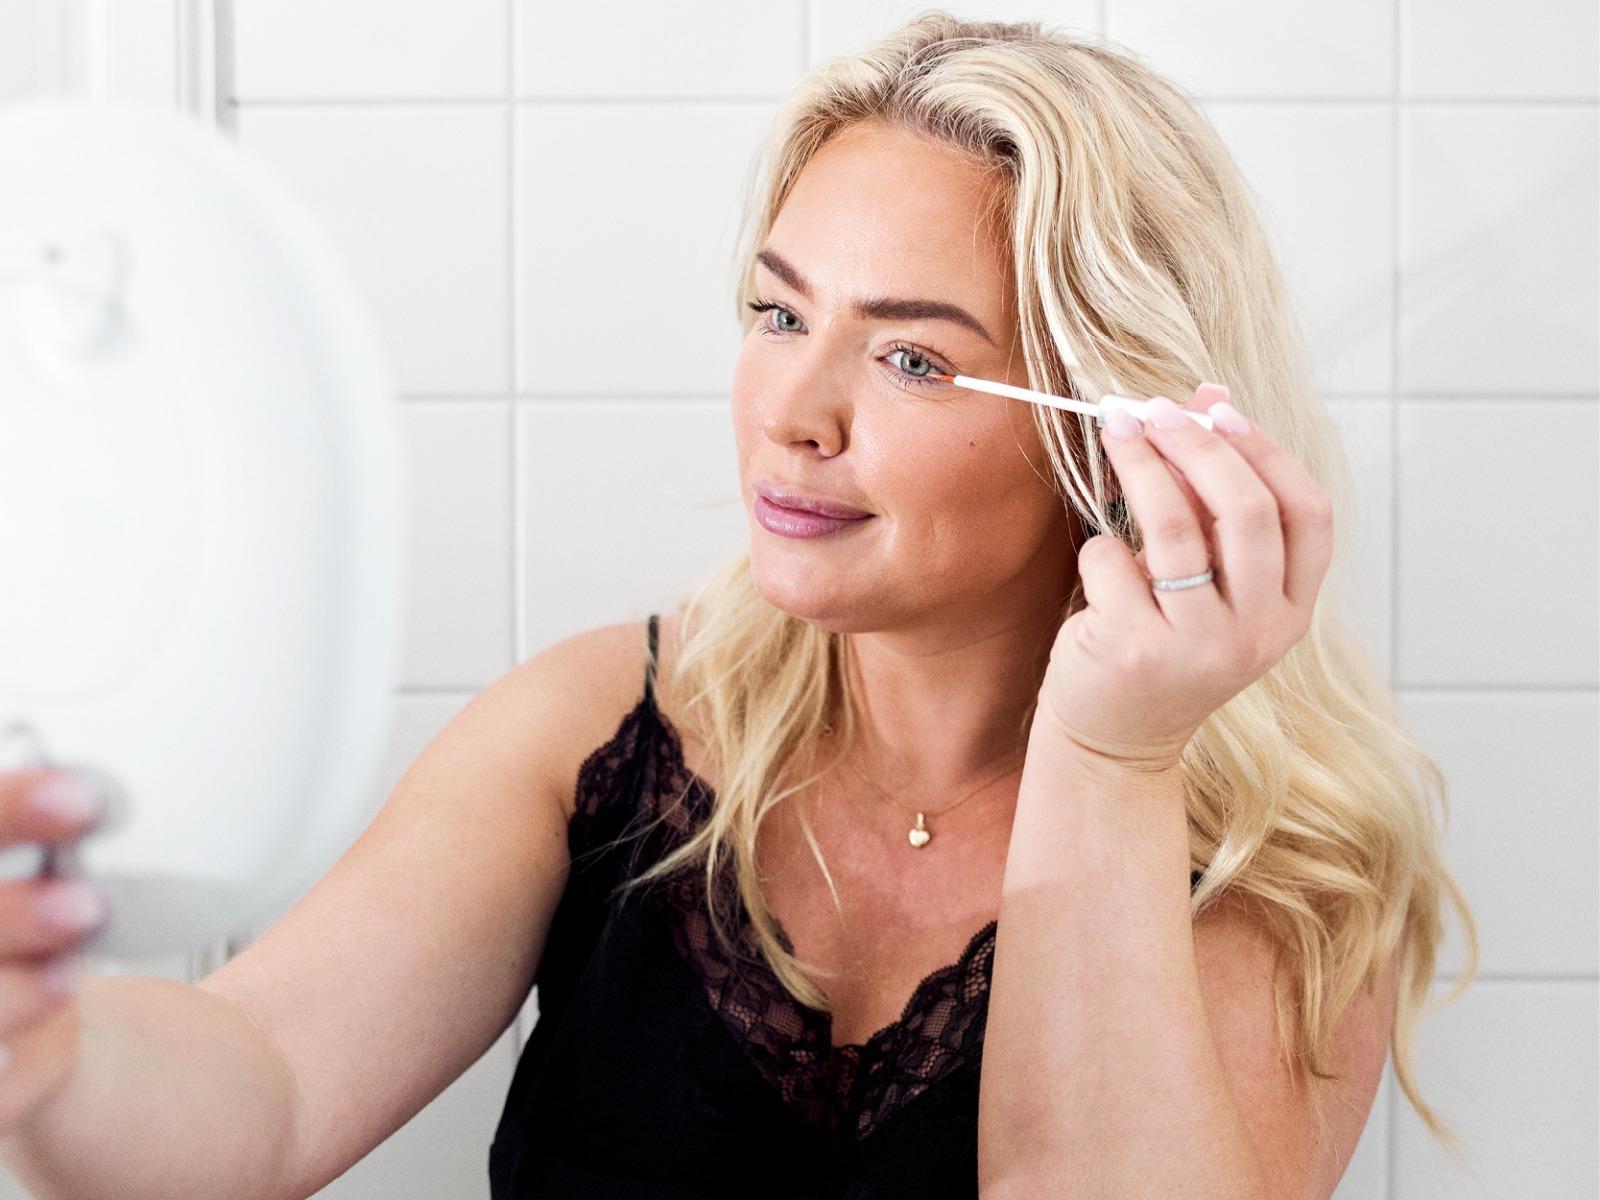 My Martens applying Eyelash Growth Serum from Swiss Clinic in a white bathroom